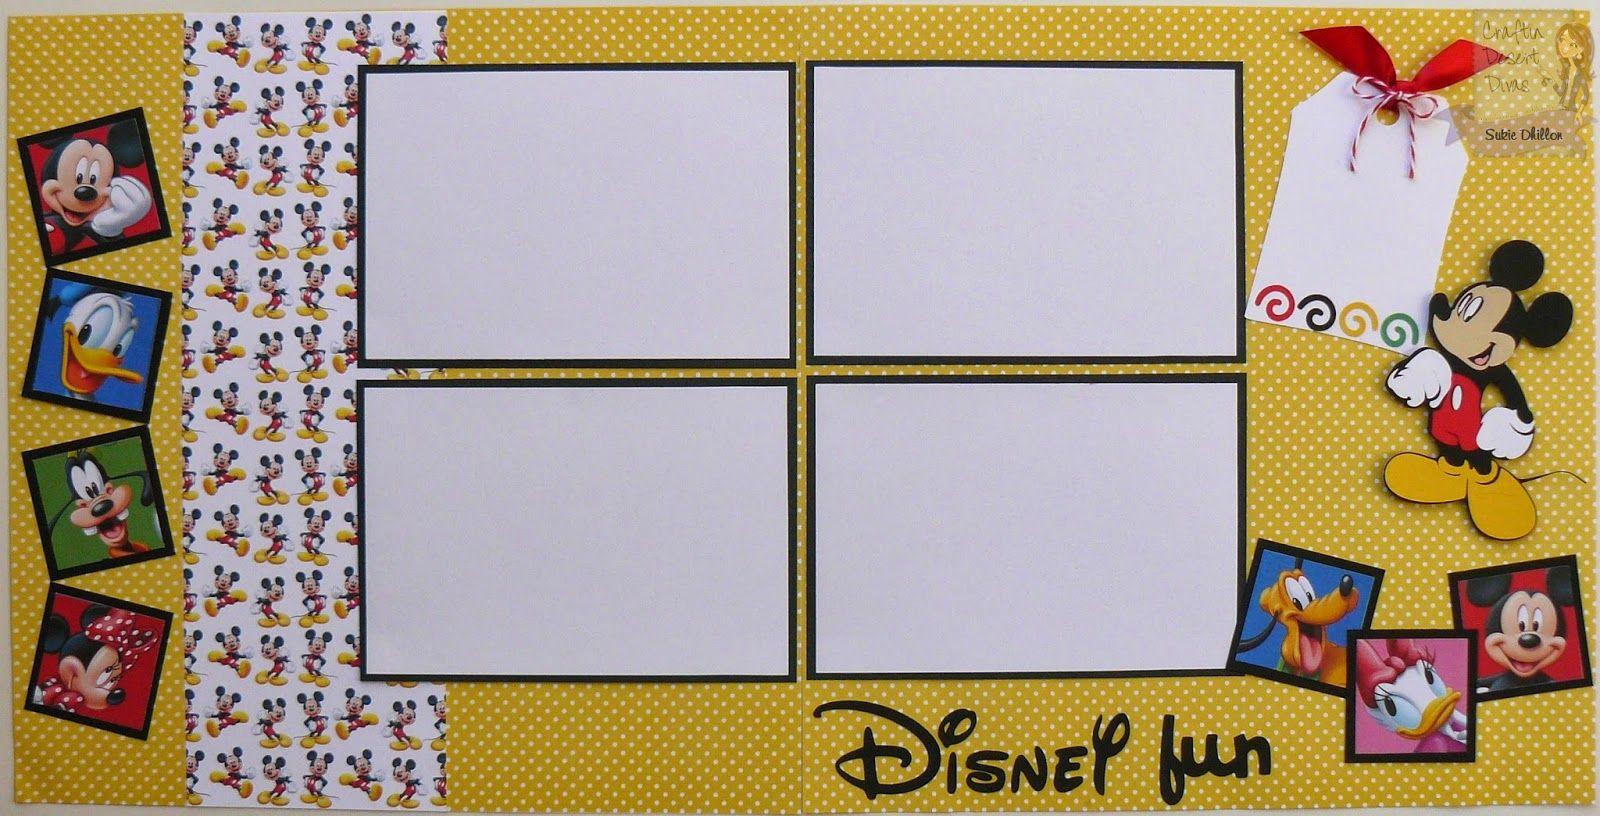 Disney Fun layout using Berry Trendy Twine!